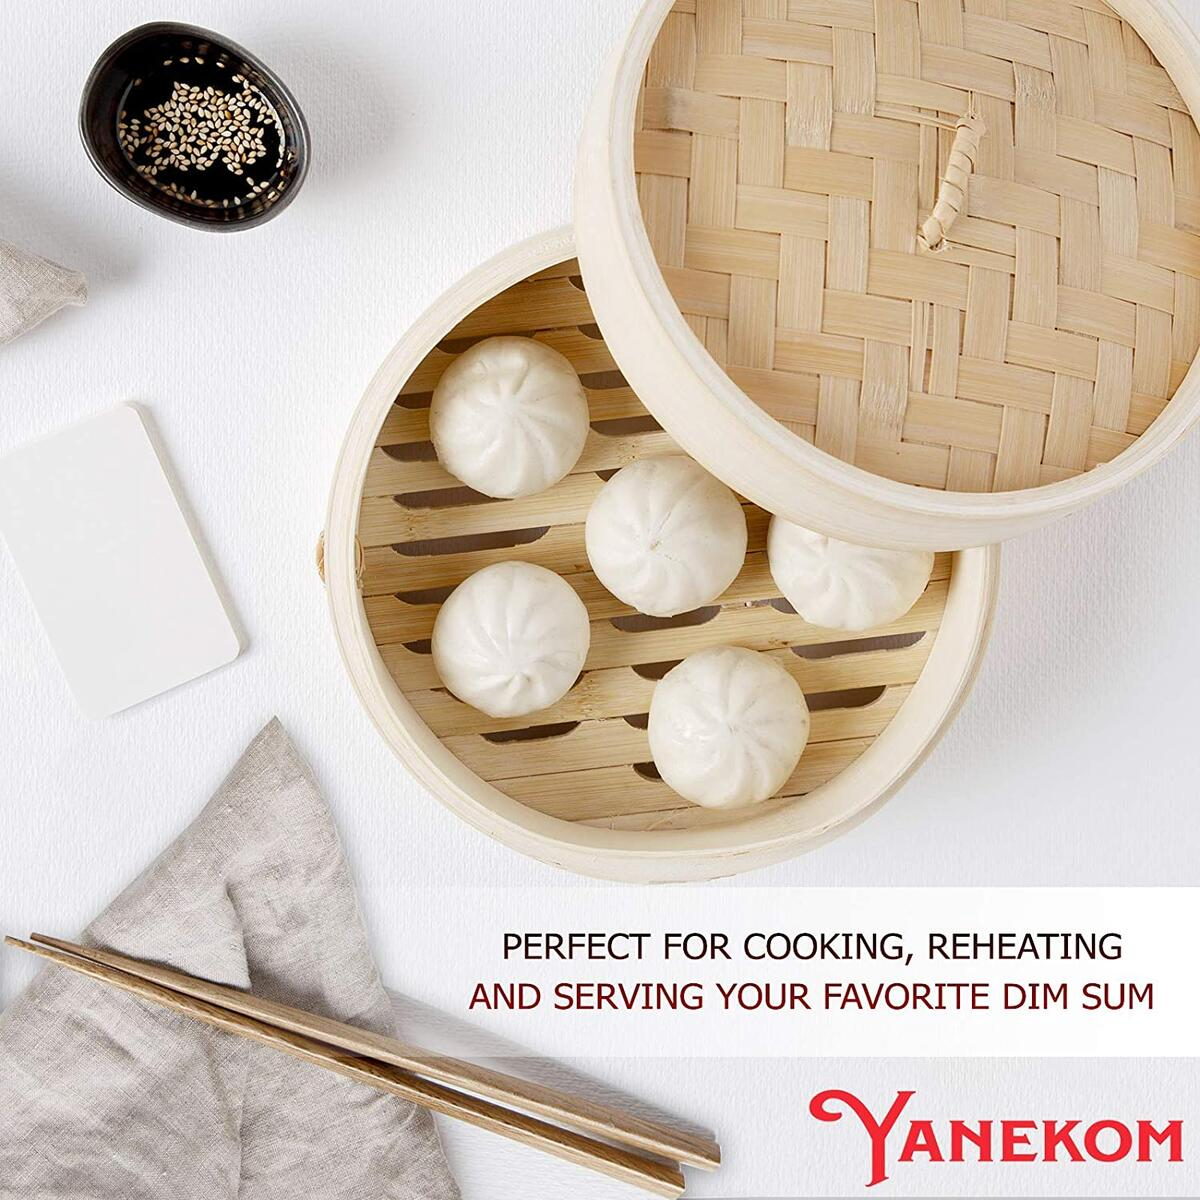 Yanekom Premium Bamboo Steamer Basket – 10 Inch Handmade Dim Sum Steamer for Cooking Dumplings, Meat, Fish, Rice & Vegetables - 2 Tiers Bun Steamer including Bamboo Chopsticks & Silicone Pads